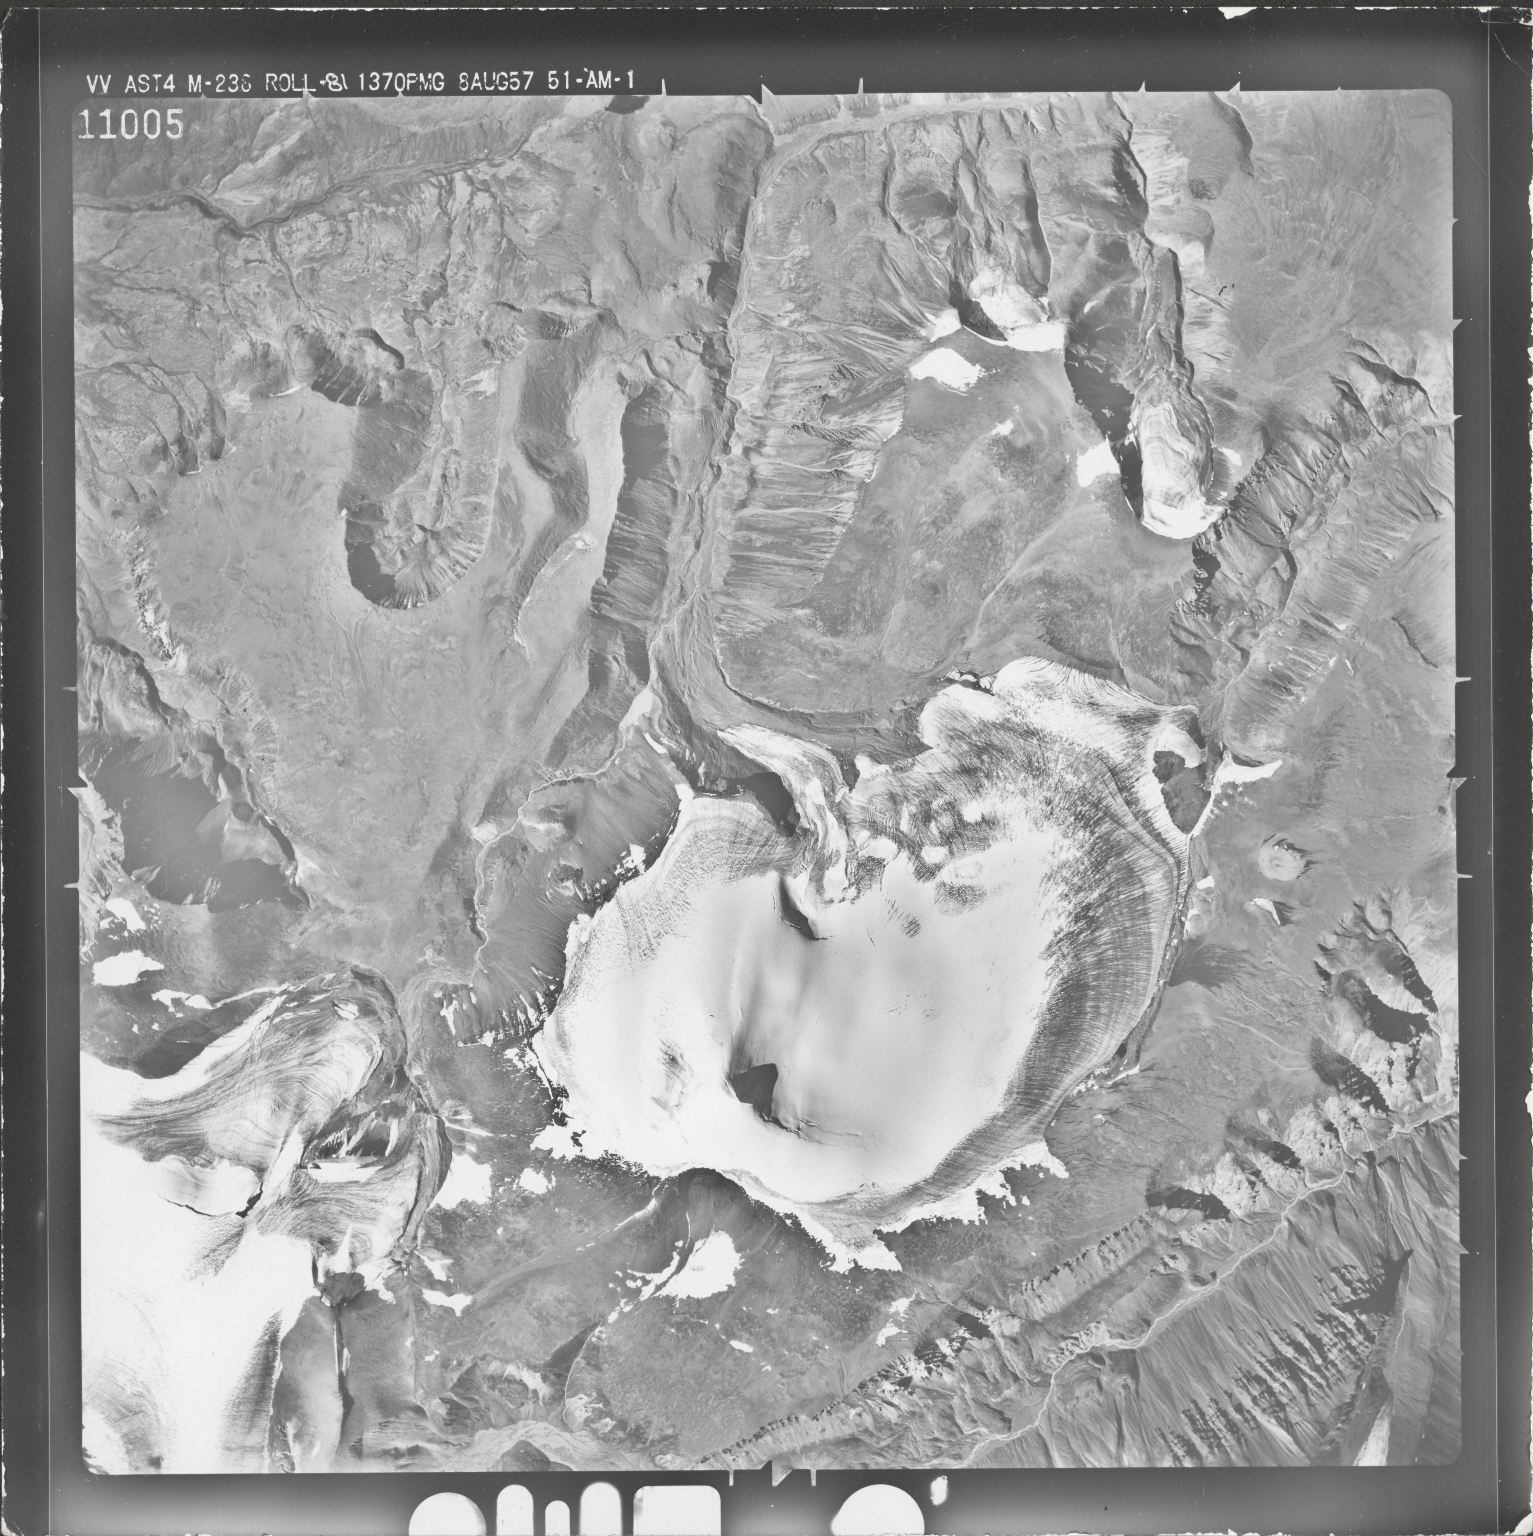 Mount Gordon, aerial photograph M 238 11005, Alaska